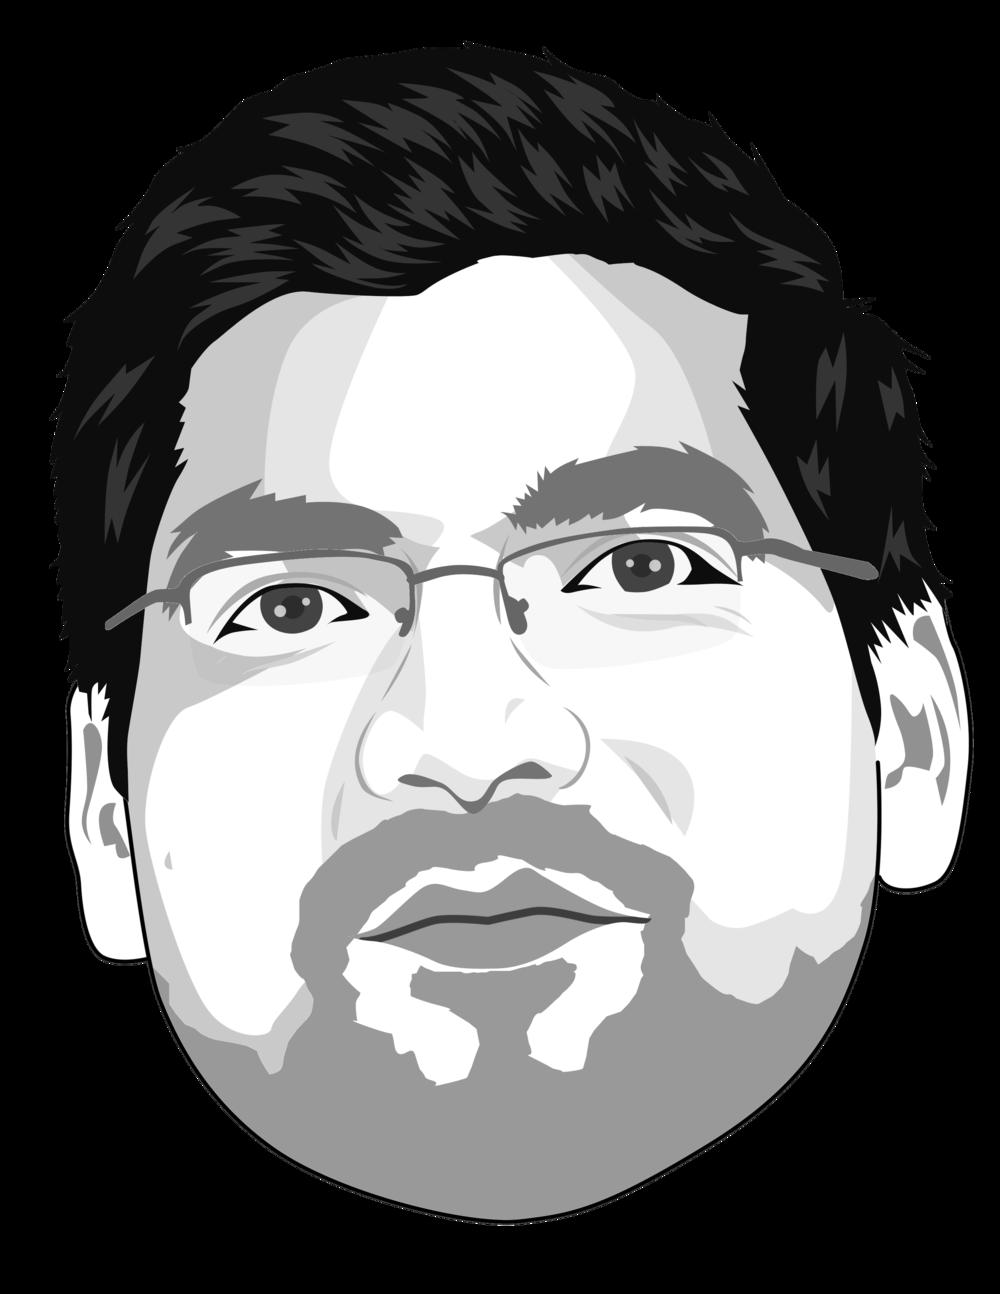 Jawahar Lal